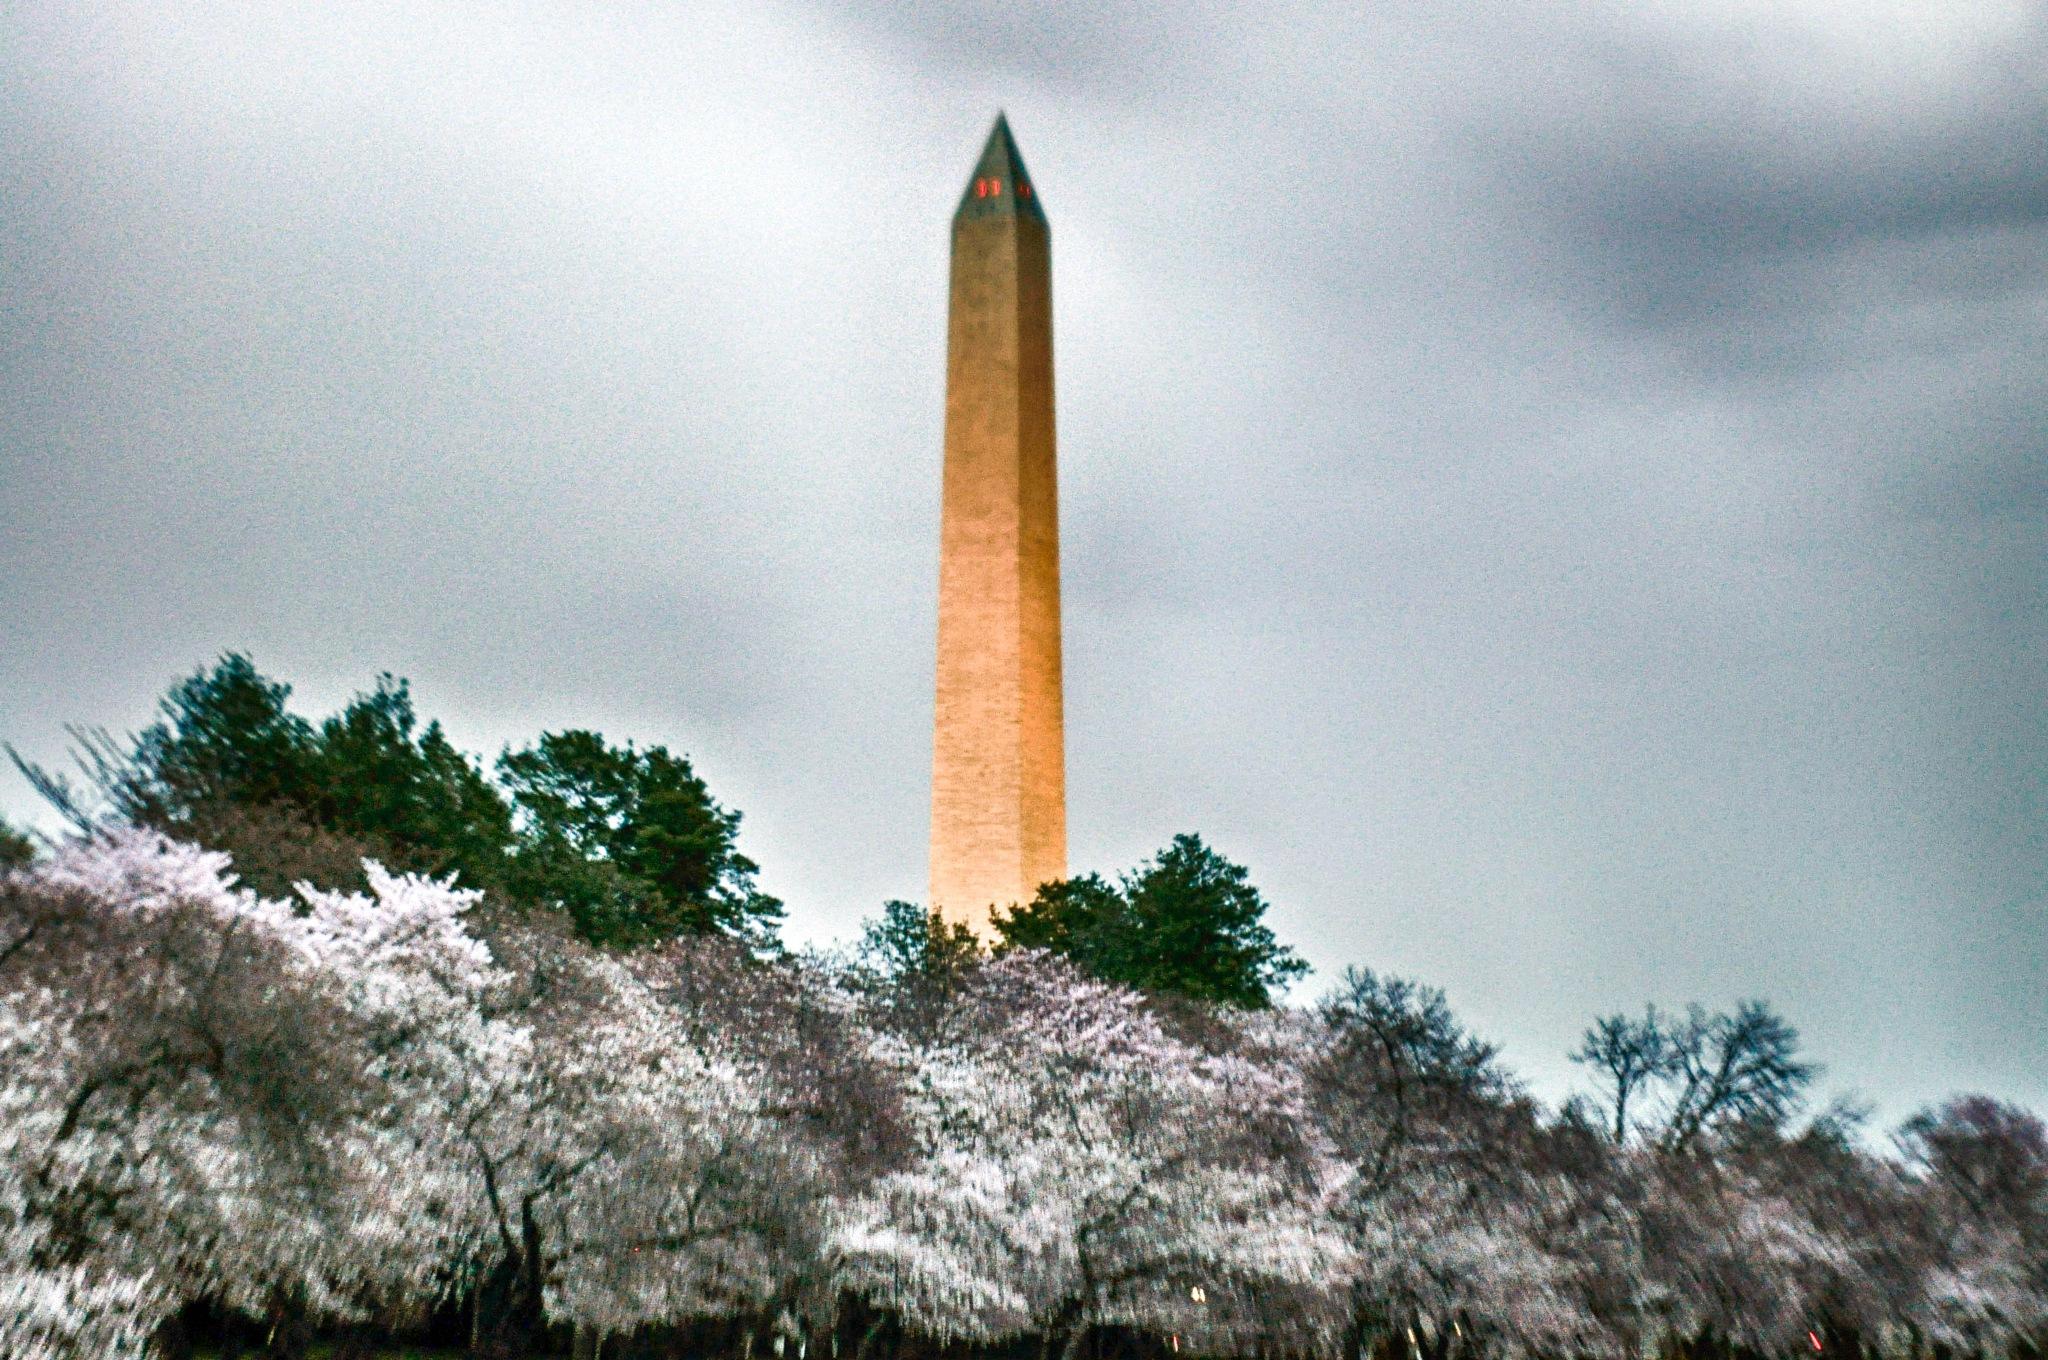 Washington Monument & Cherry Blossoms/2018 by aemdigitalphotography